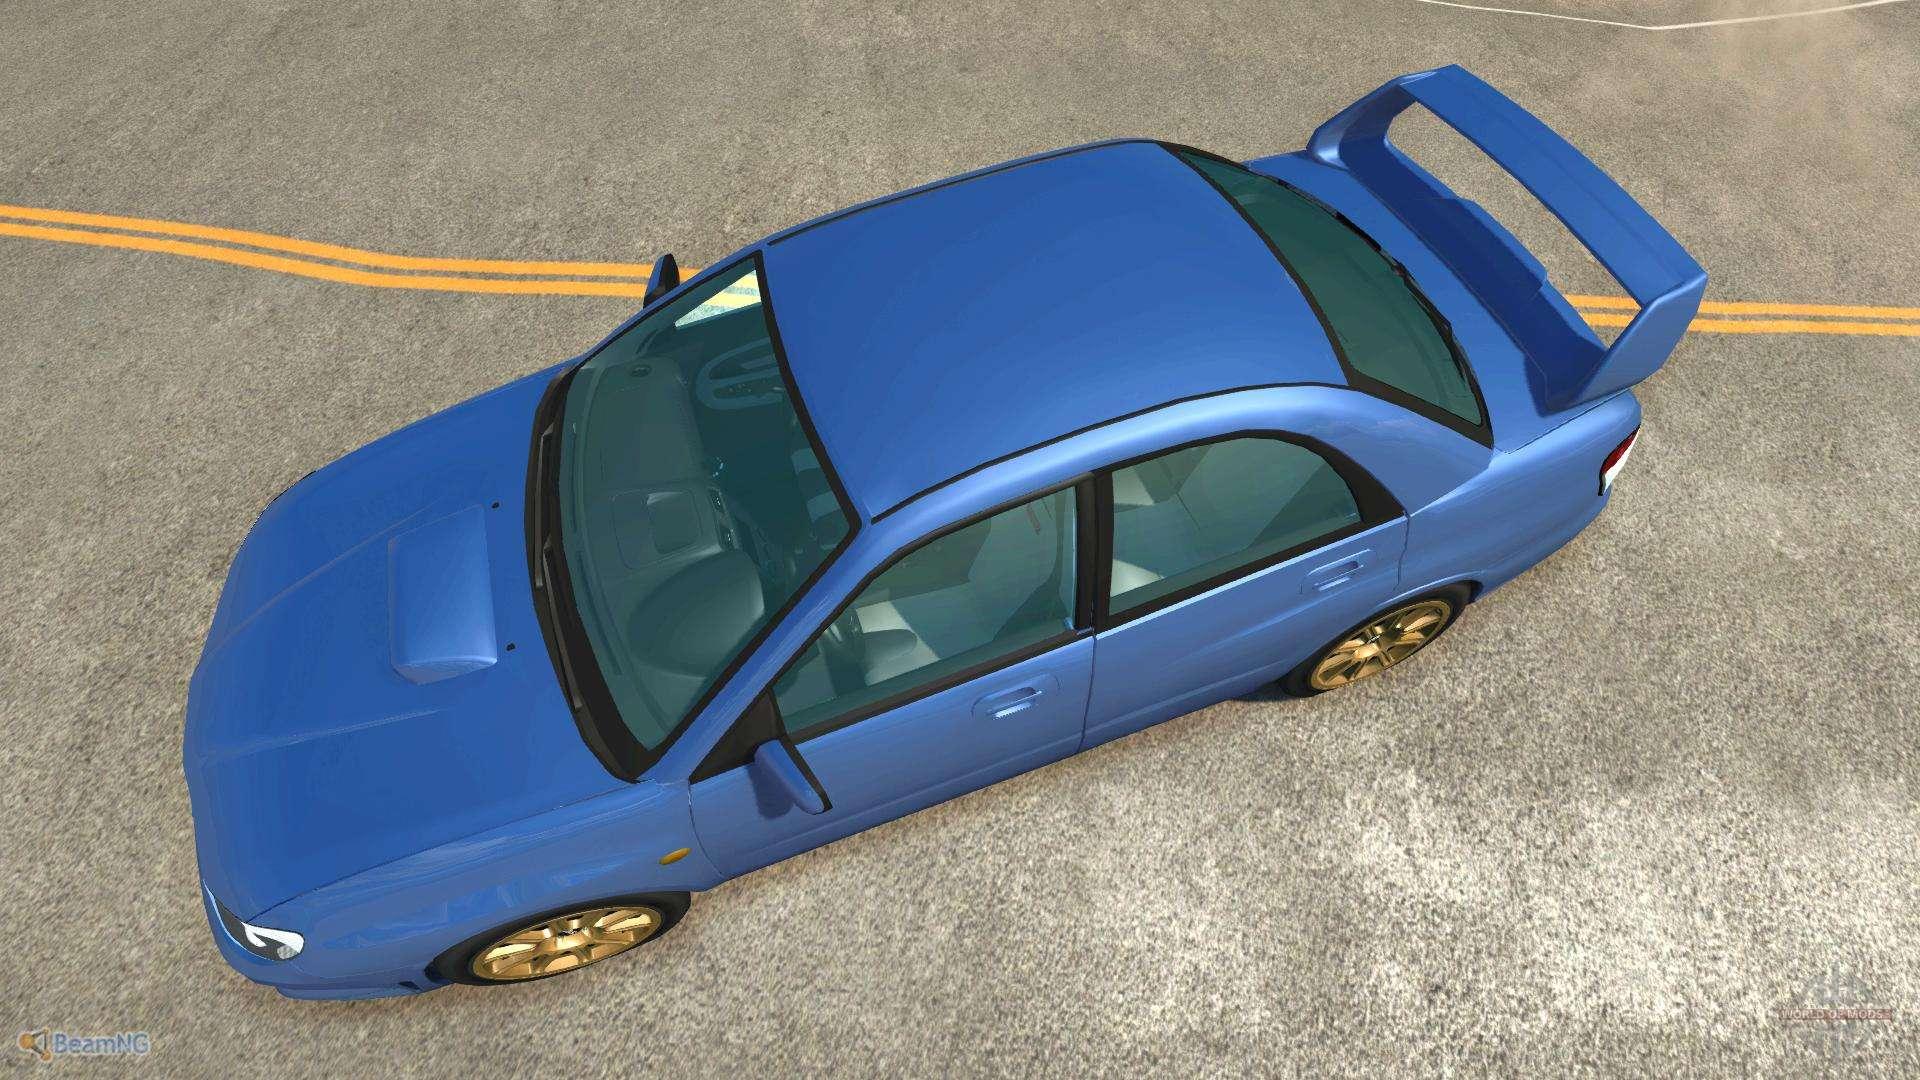 Subaru Impreza Wrx Sti F 252 R Beamng Drive